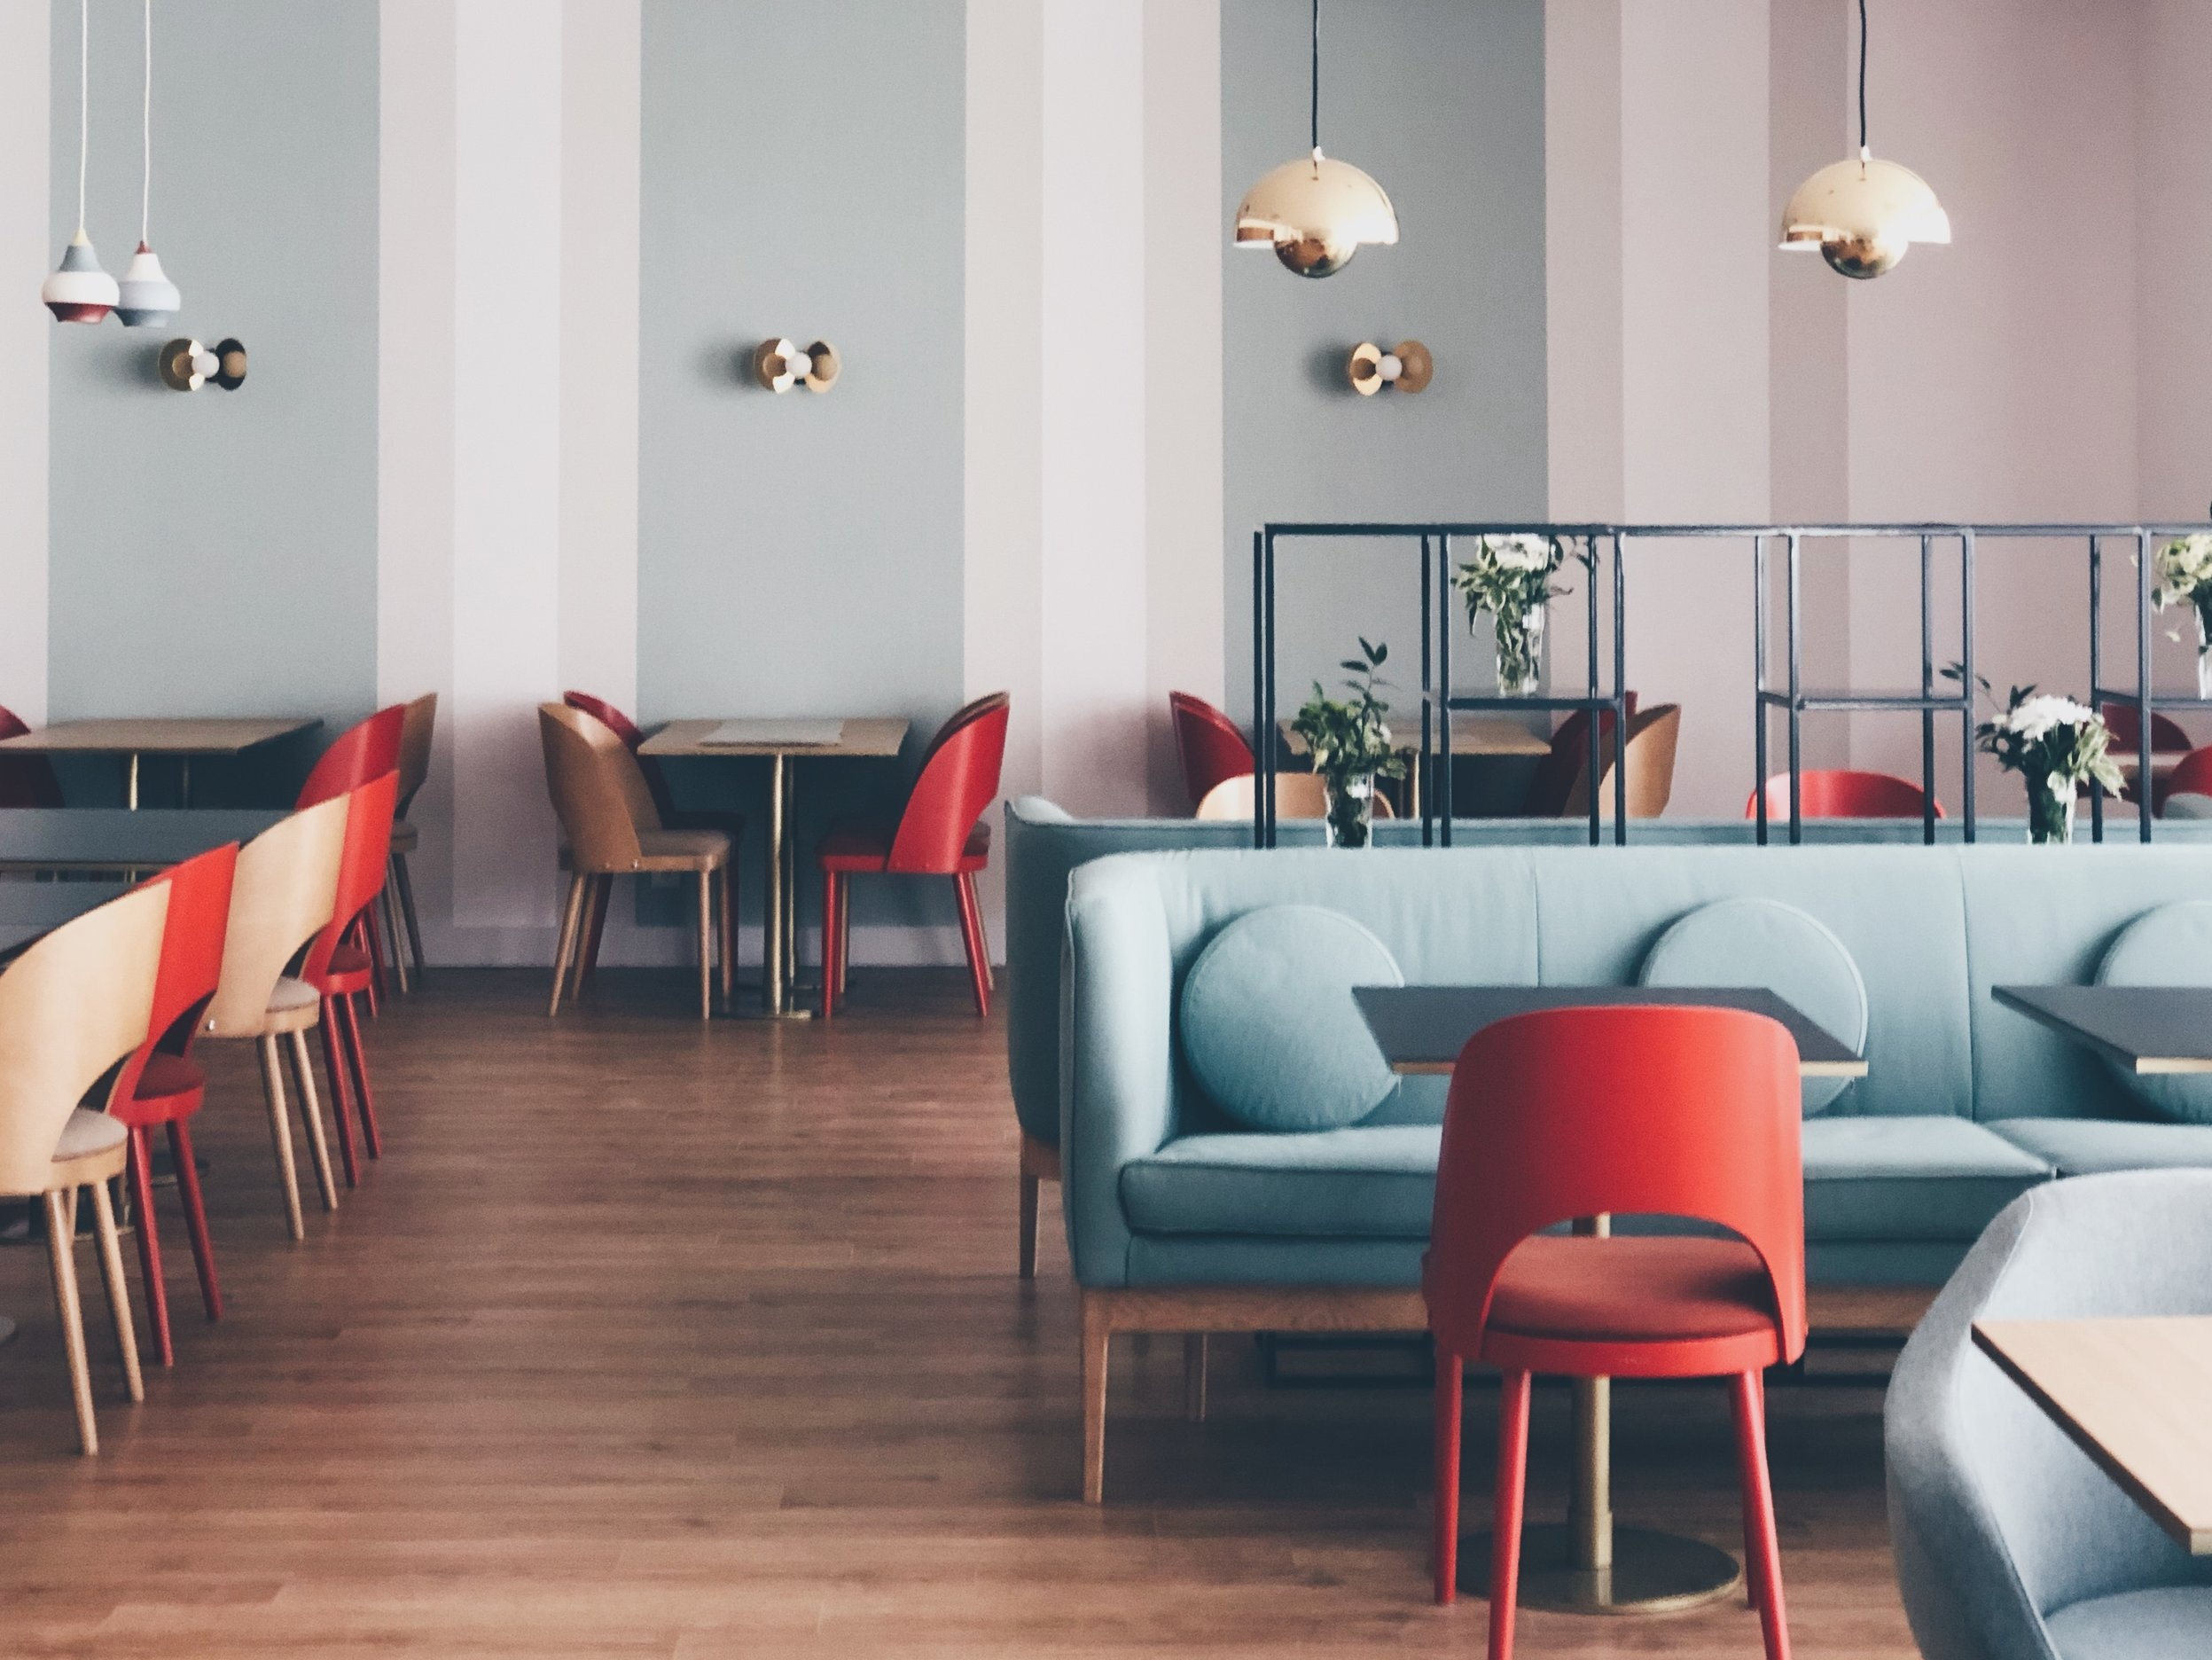 Ilios     wall light | 150OL-W01 Design LOFT | Photo Mikolai Adamus | Hotel Altus in Poznan